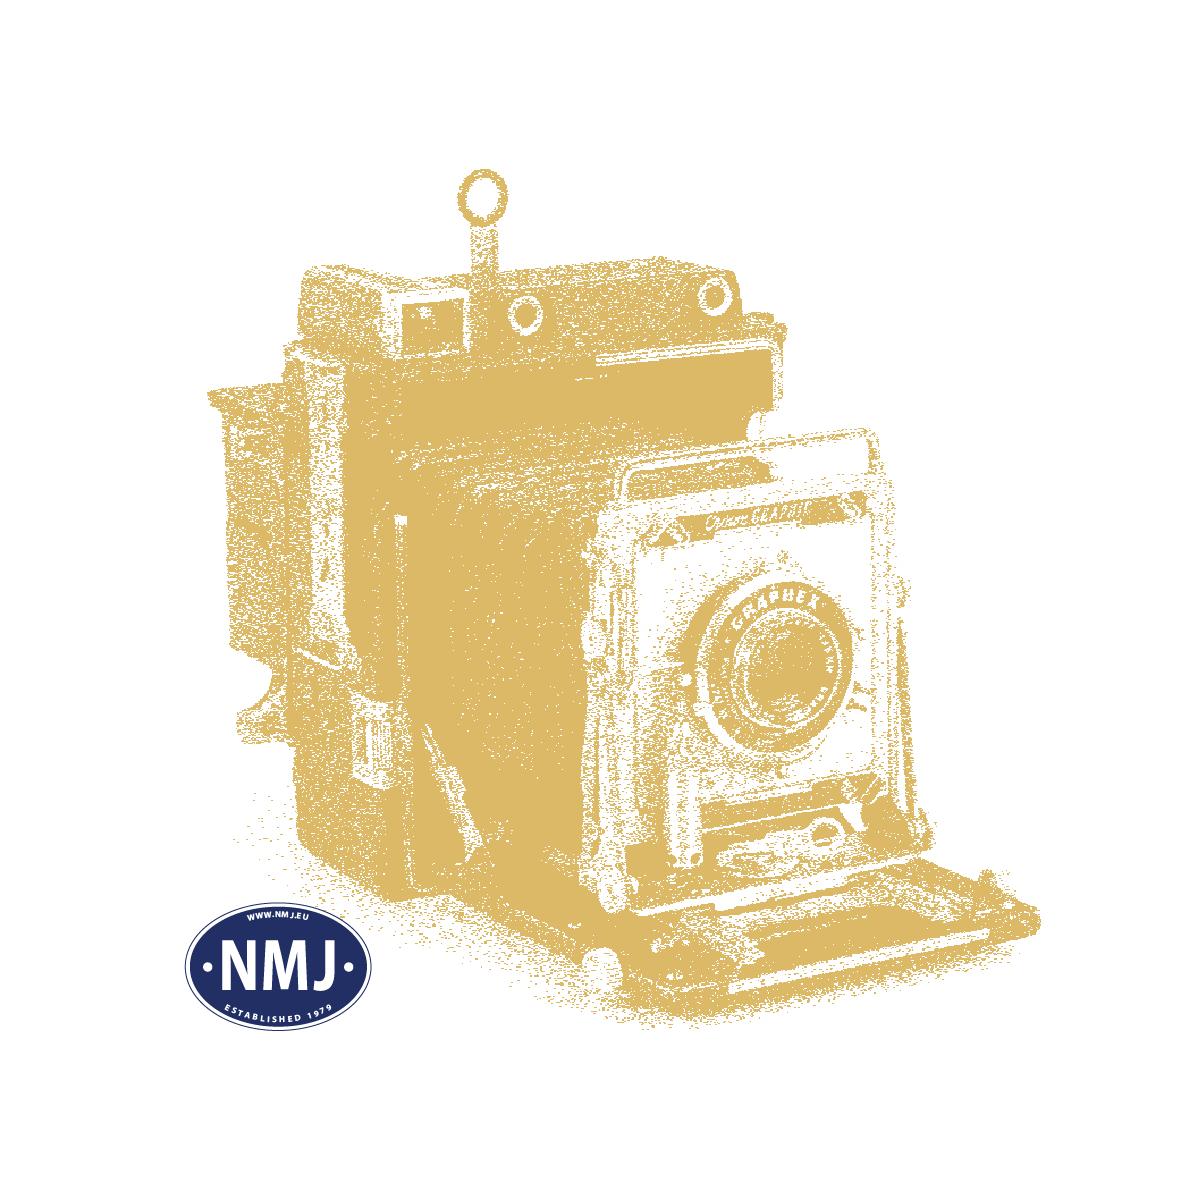 MBR55-1003 - Gressmatte #3, 30 x 40 Cm